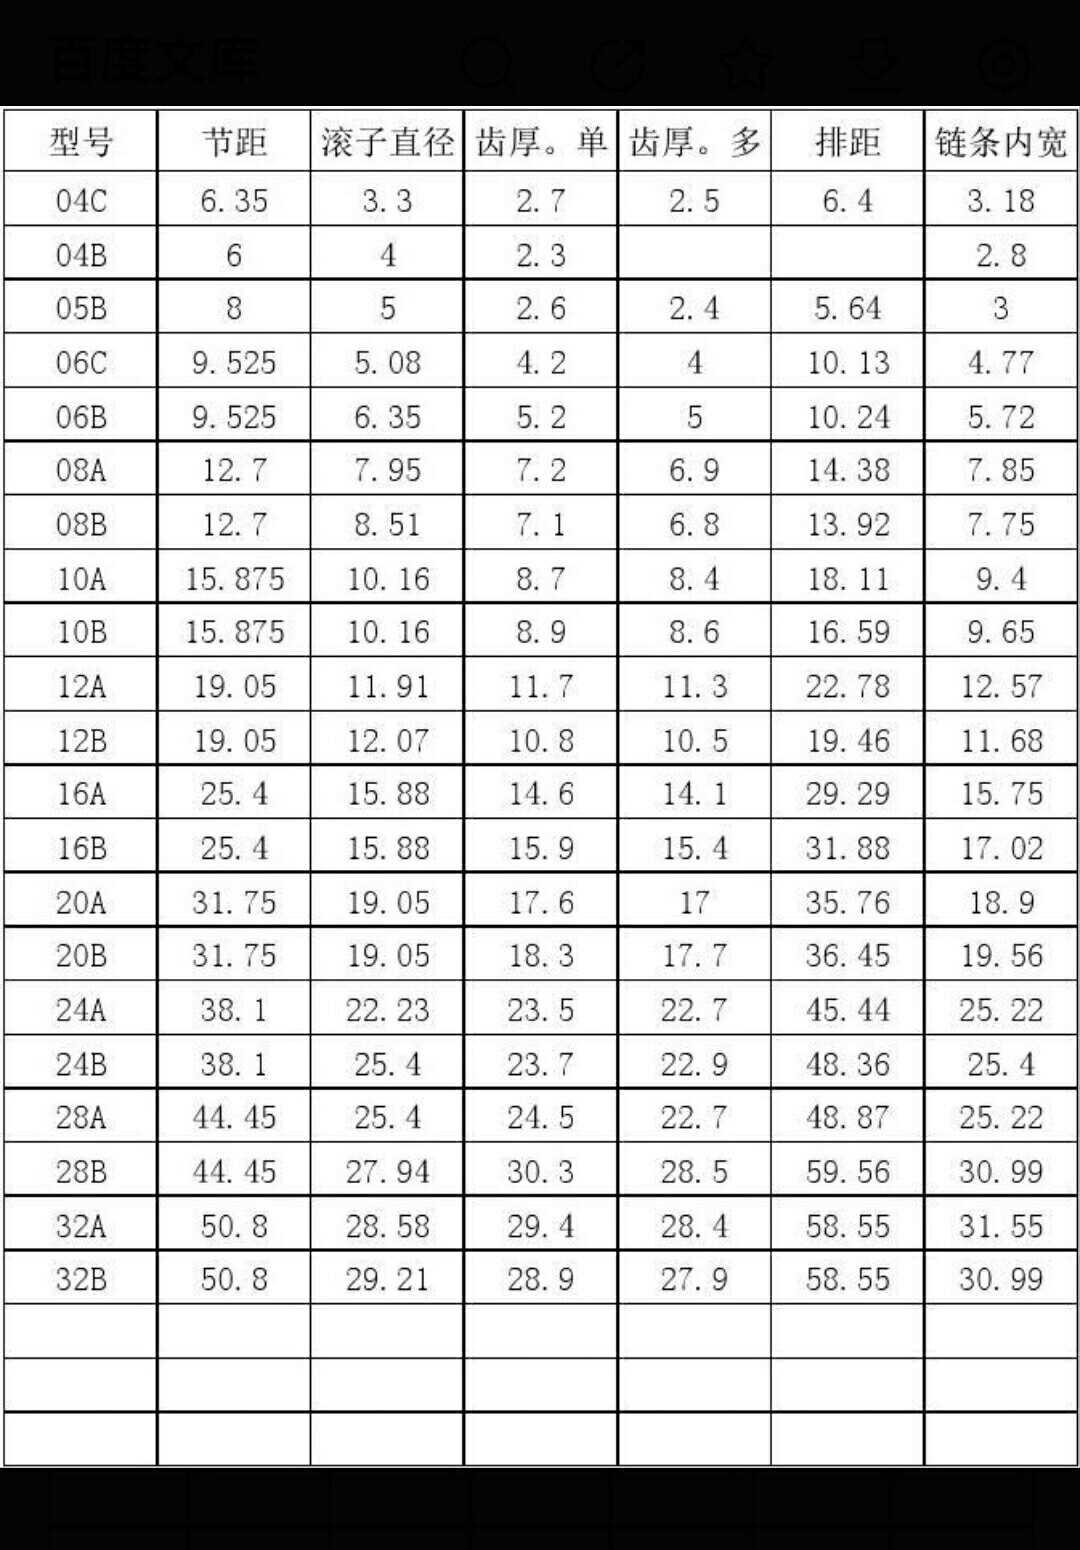 06C звездочку поле 9.525 барабана диаметром 5.08 4.2 есть 04B08A10A12A16A24A28A48 толщина зуба